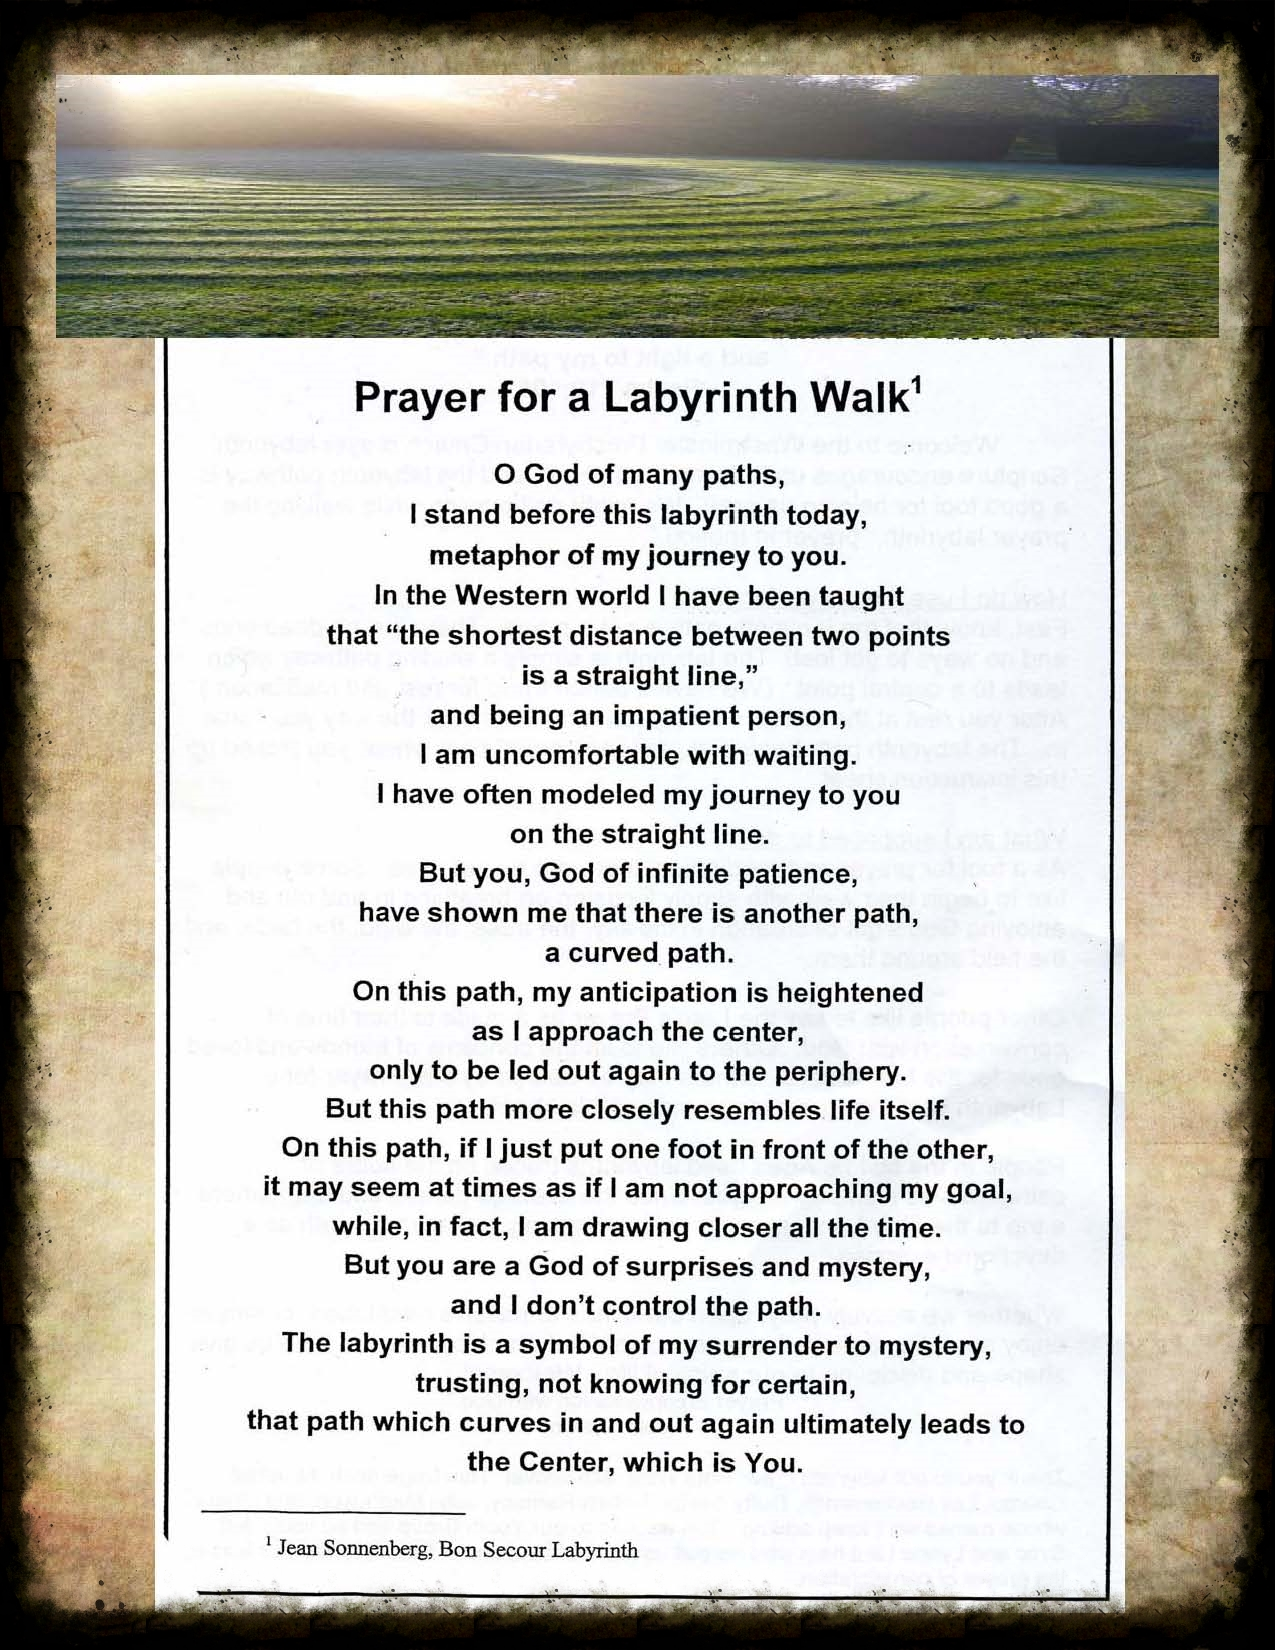 Prayer for a Labyrinth Walk